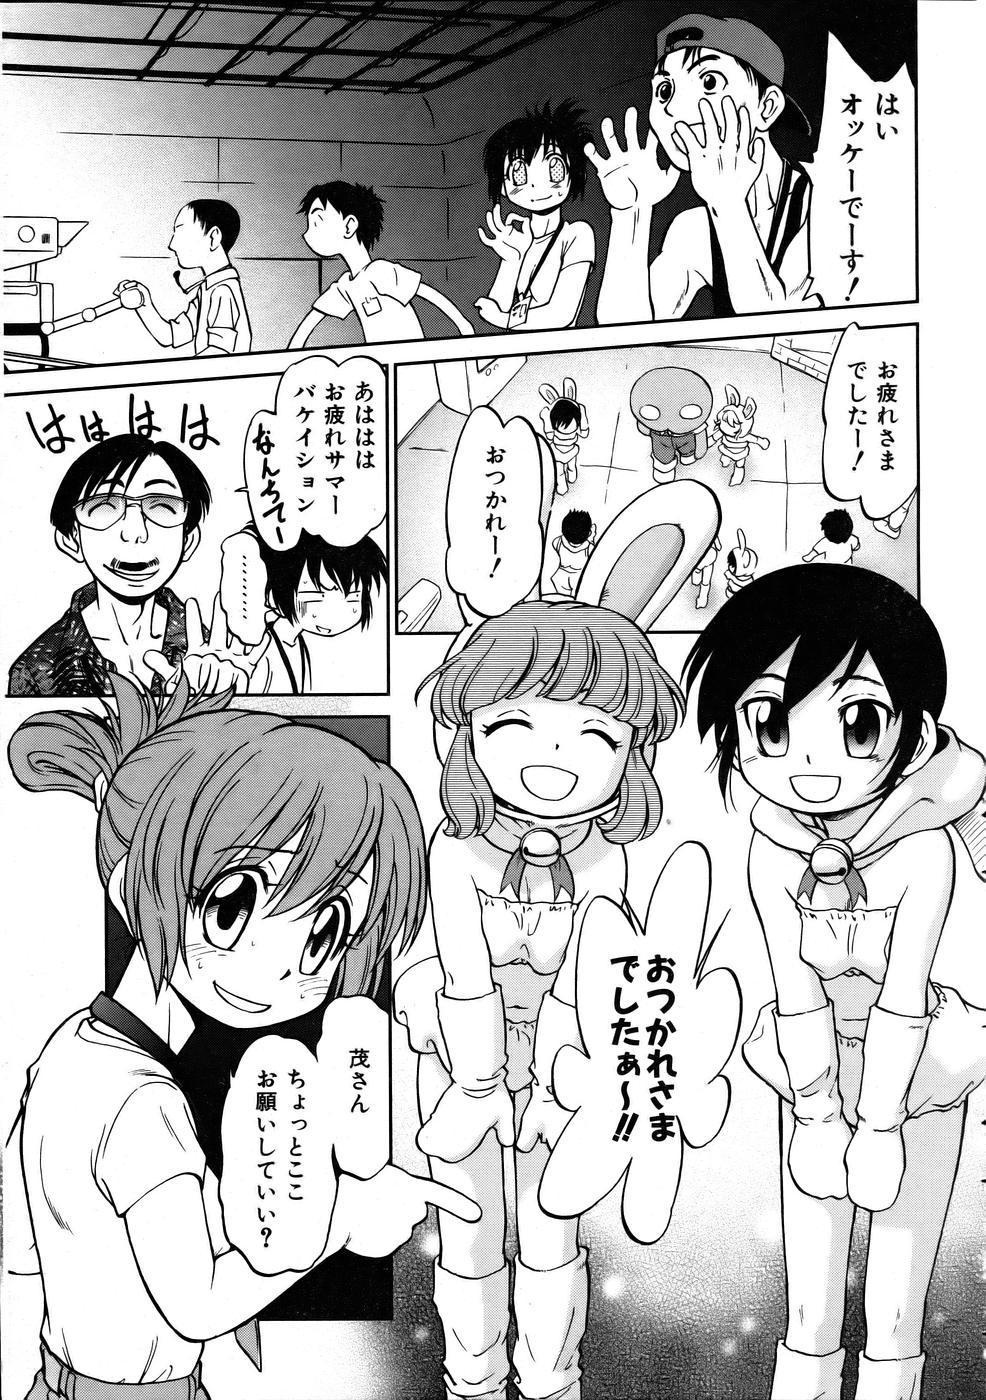 COMIC AUN 2005-10 Vol. 113 110